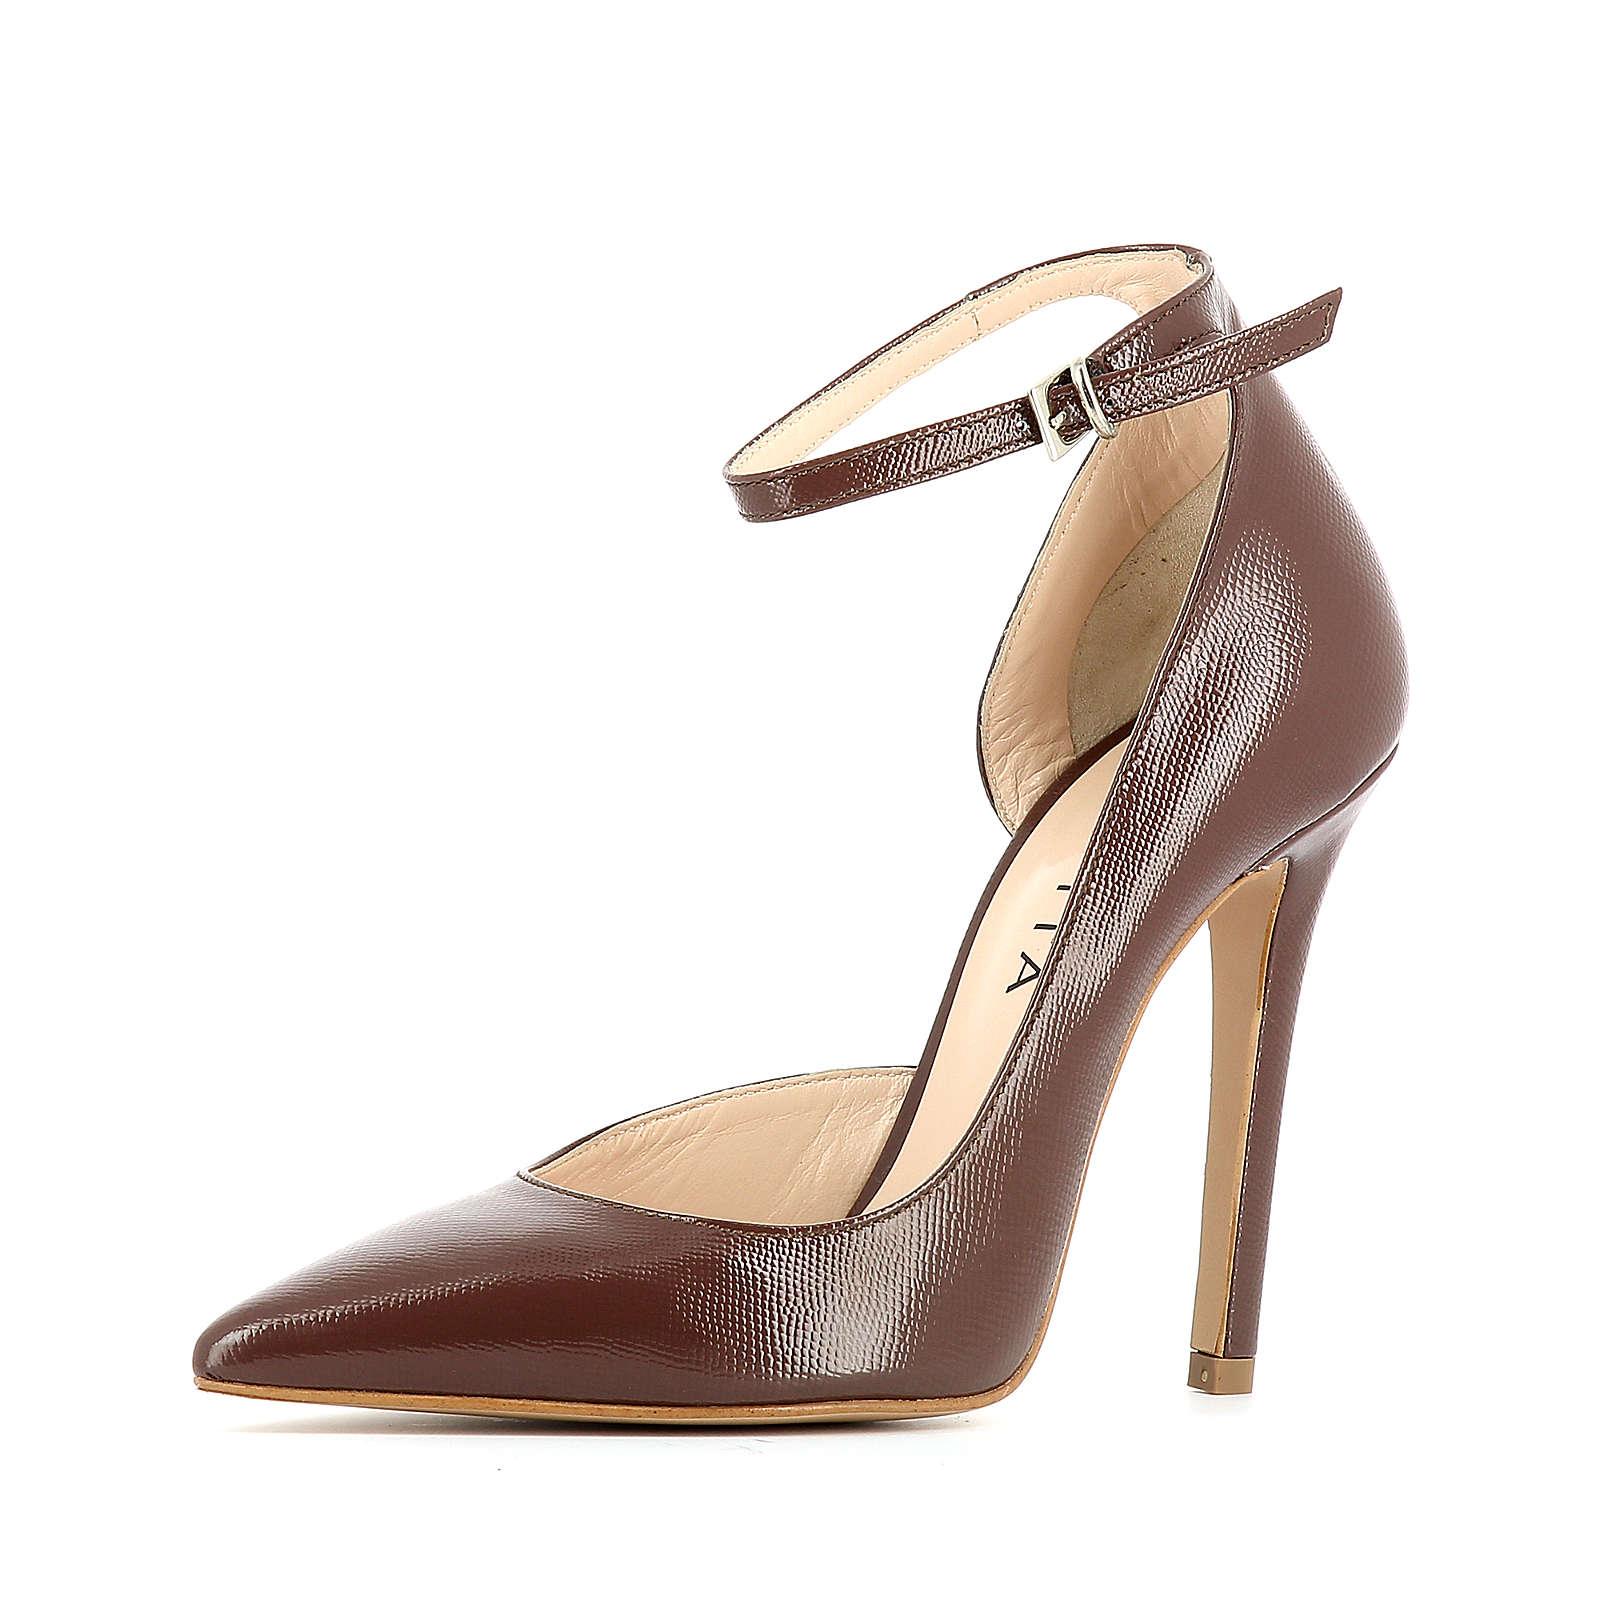 Evita Shoes Pumps khaki Damen Gr. 36